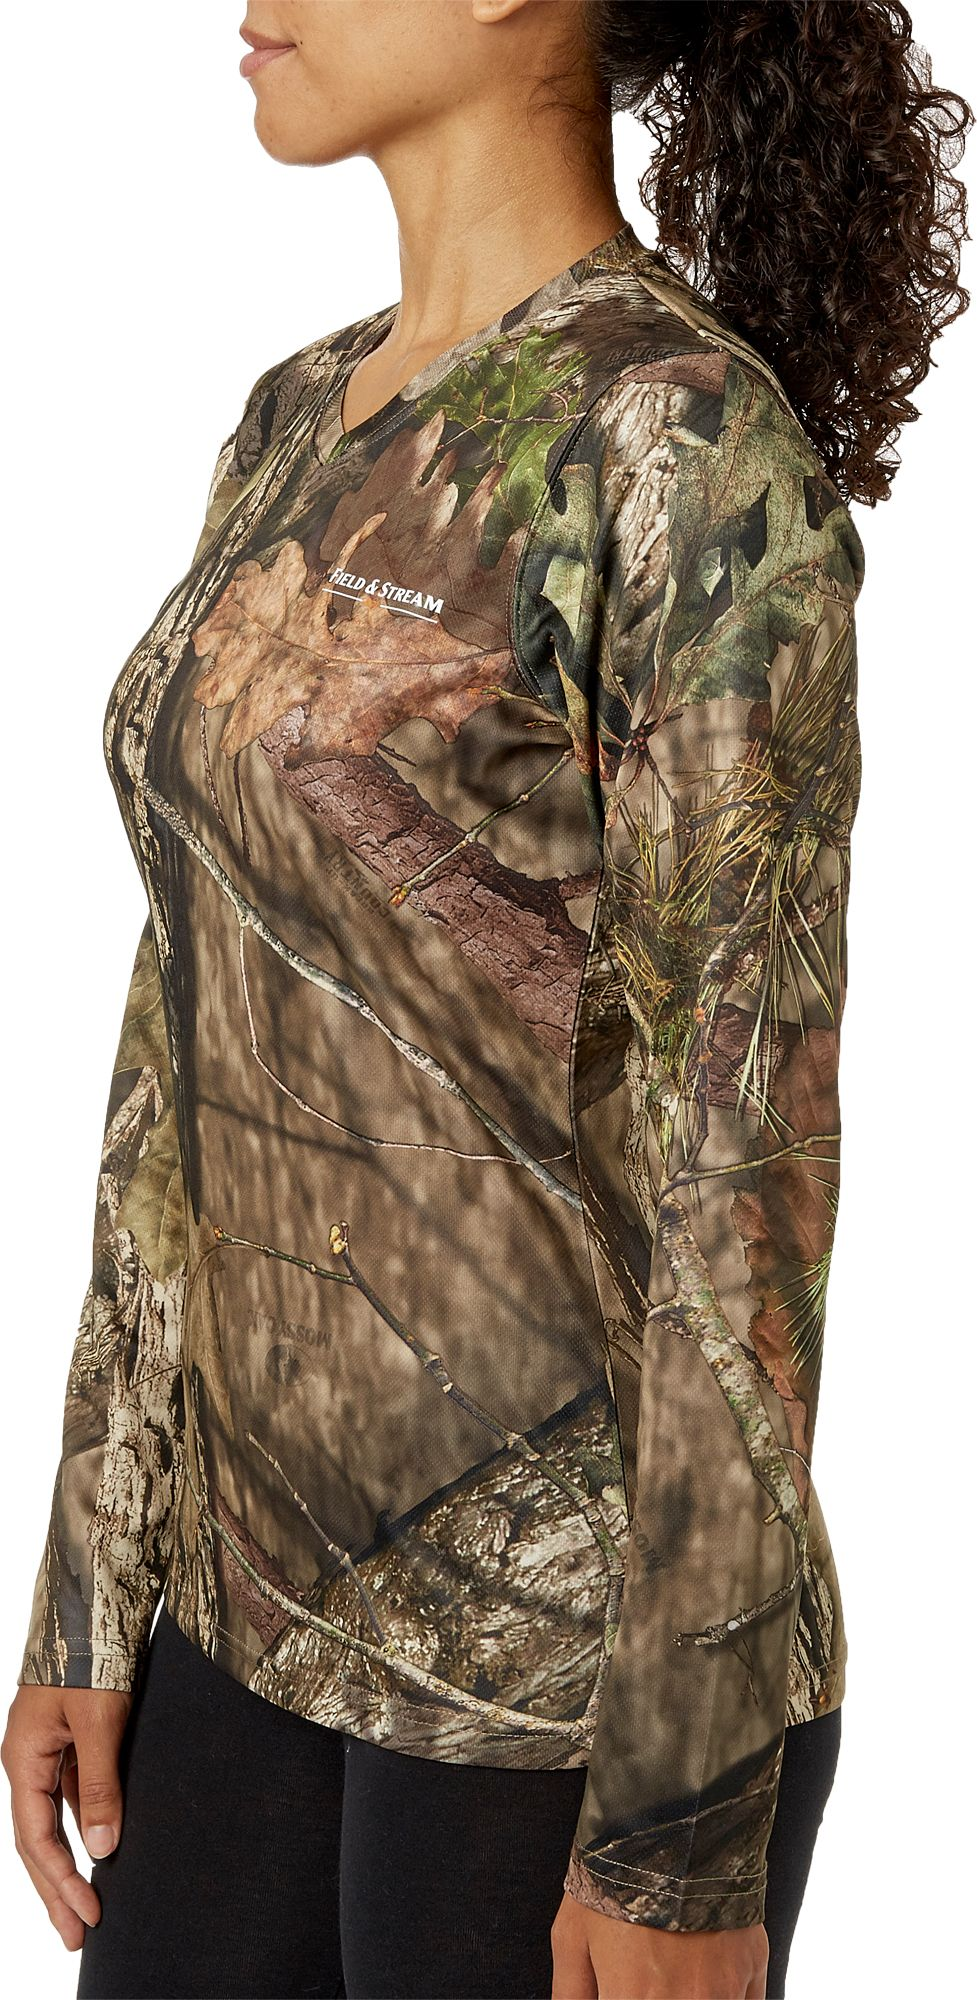 Field & Stream Women's Long Sleeve Camo Tech Tee, Size: Small, Green thumbnail